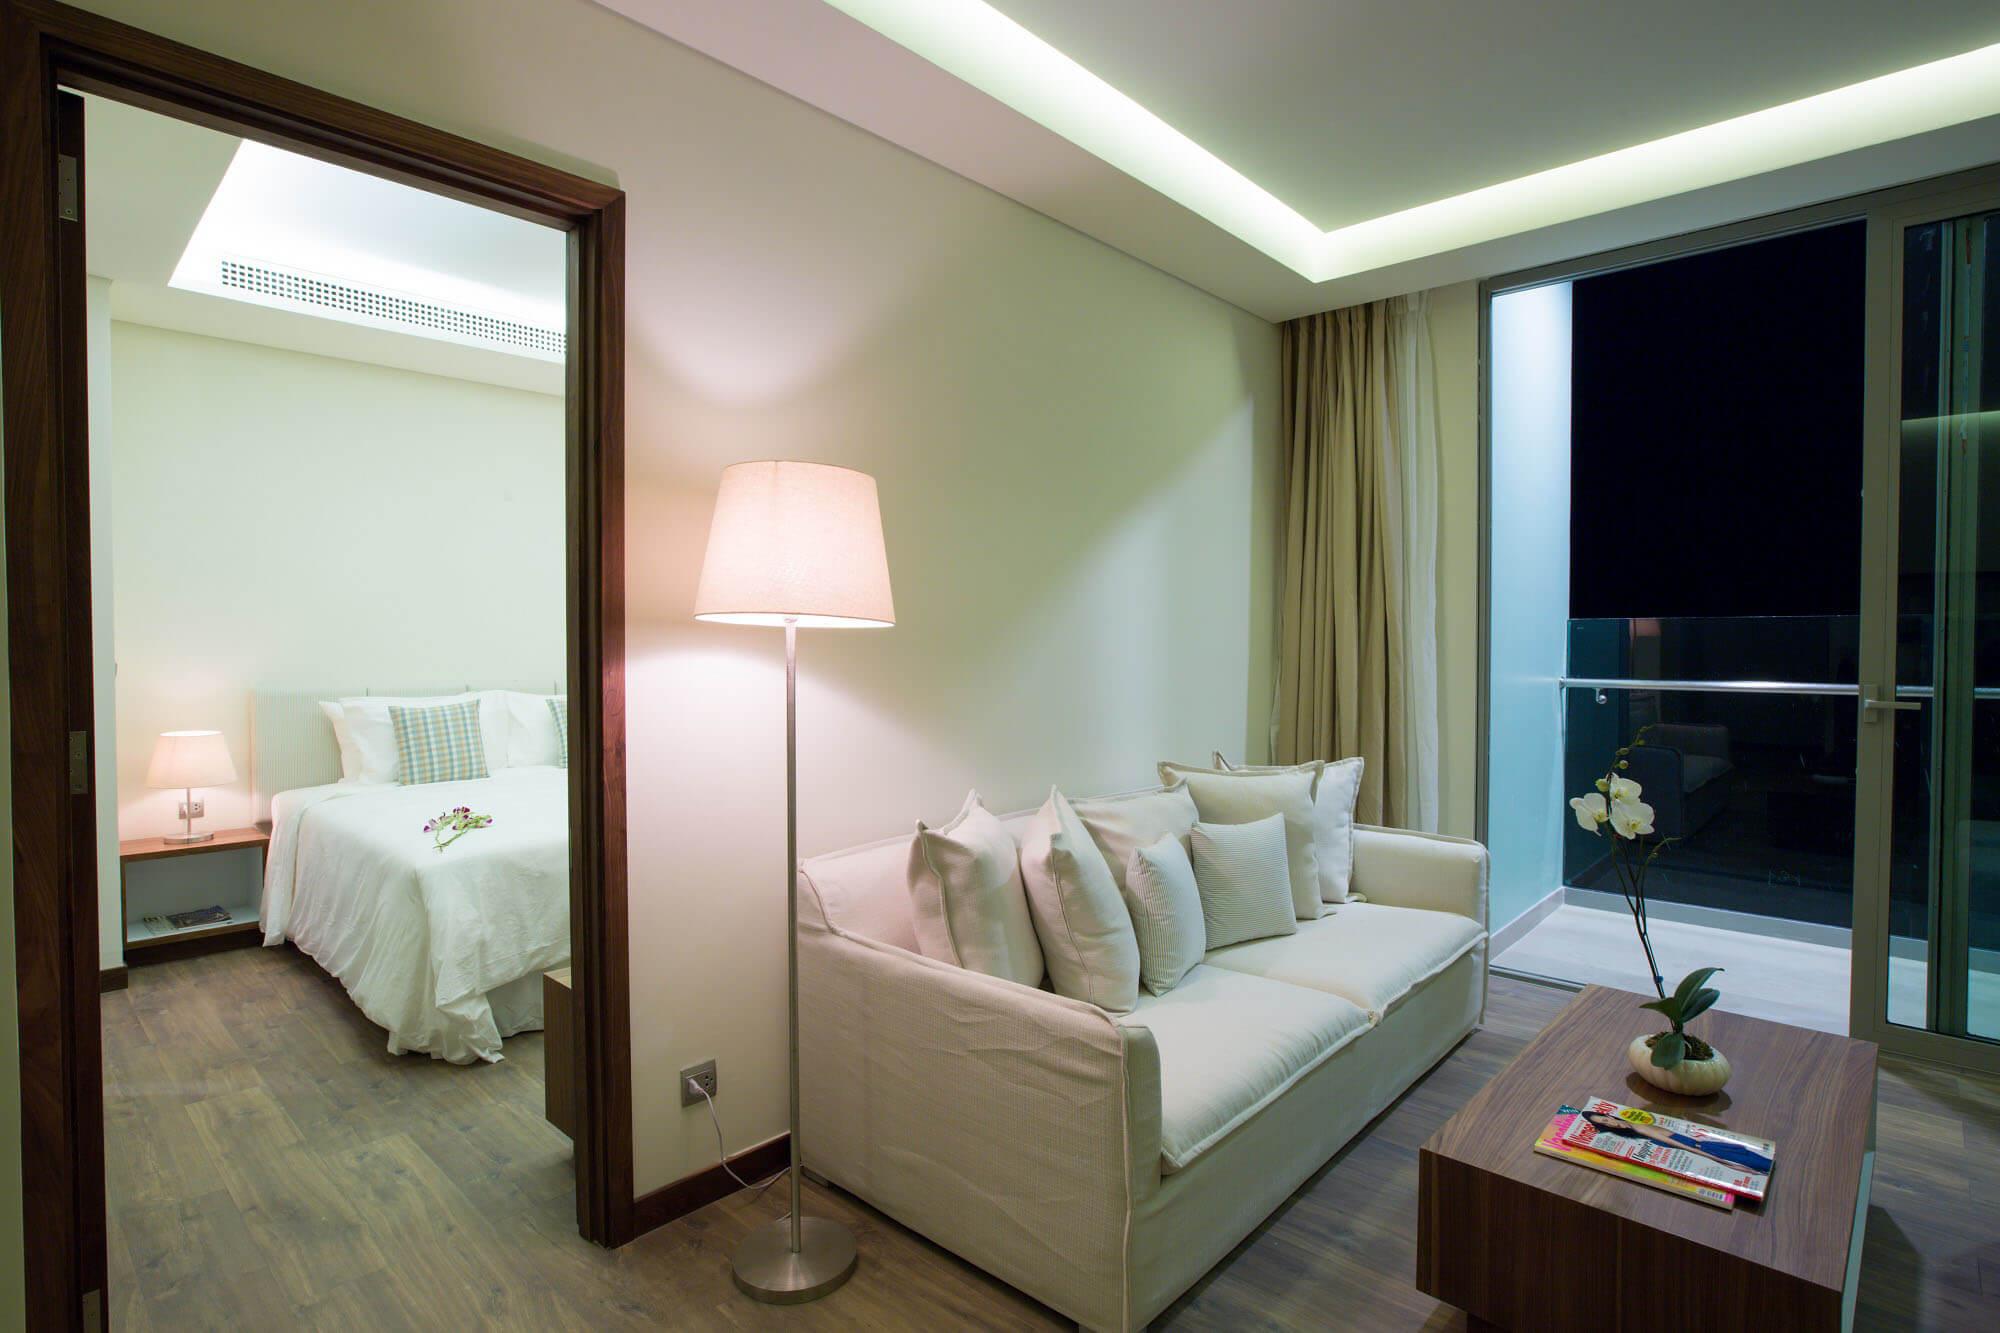 Highlight Plus Apartment Apartment A La Carte Danang Beach Hotel 200 Vo Nguyen Giap Danang Fantasticity Com 03